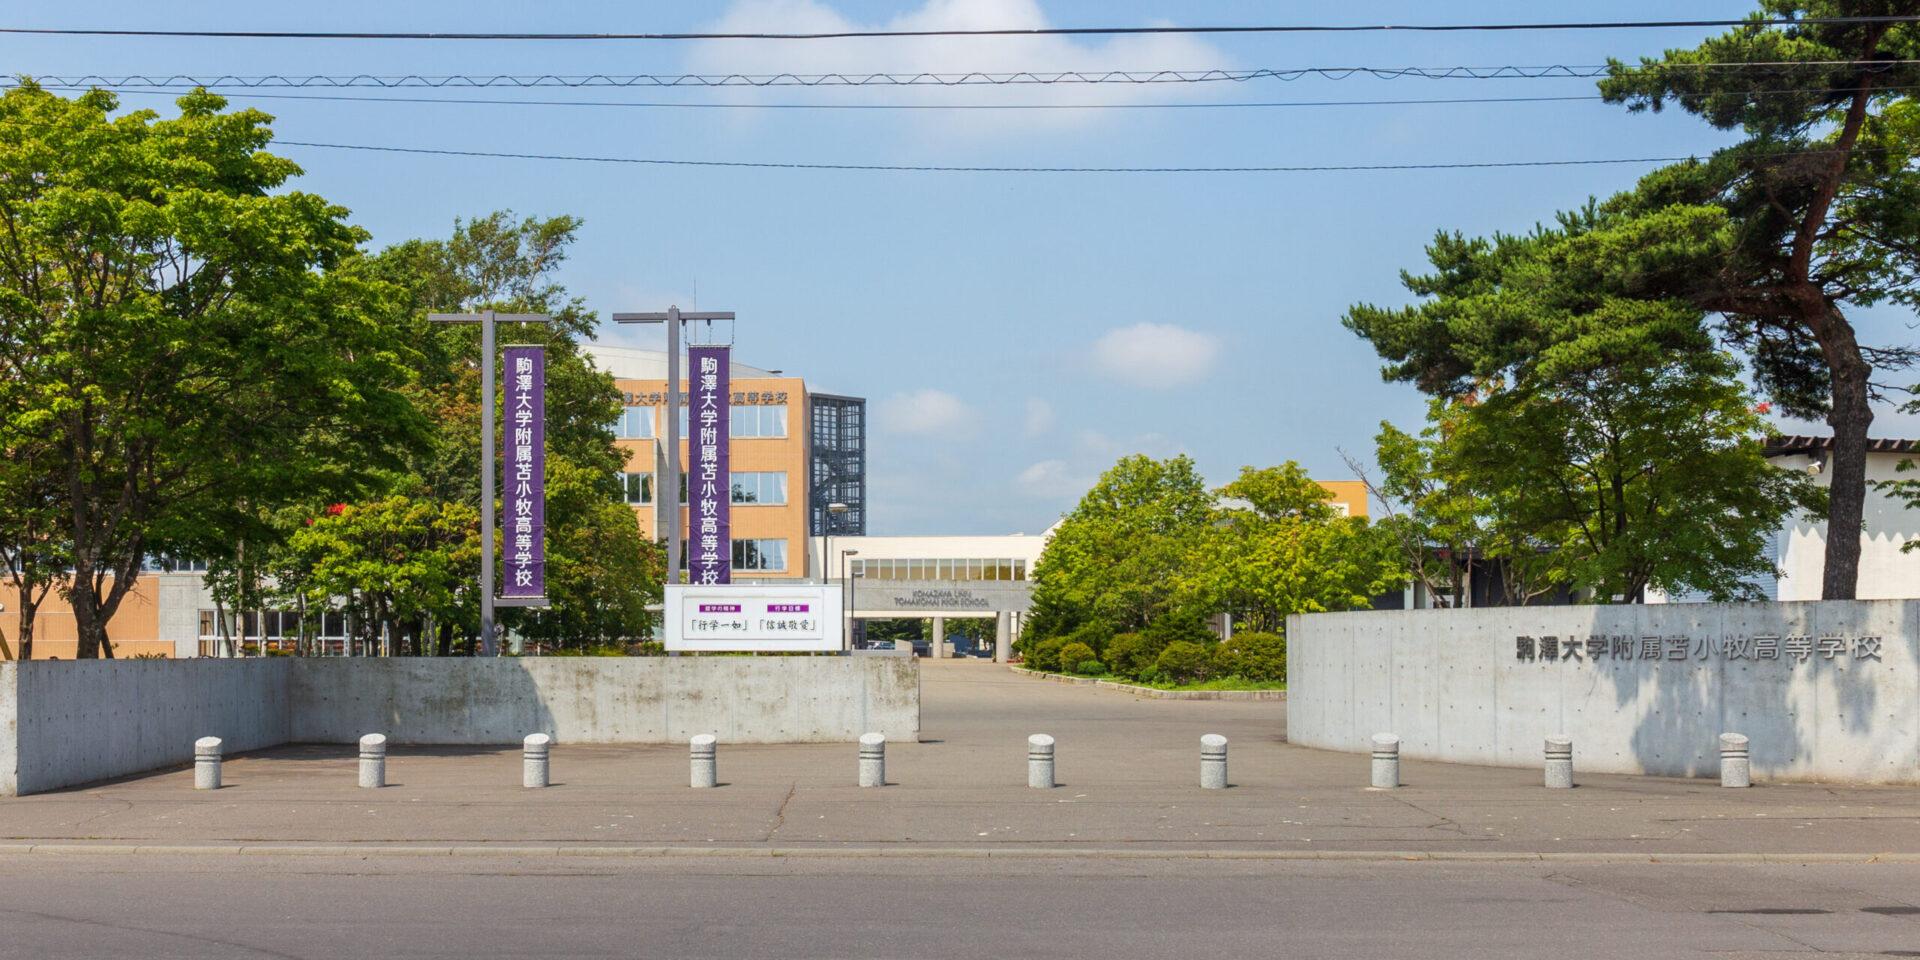 駒澤大学附属苫小牧高校の画像